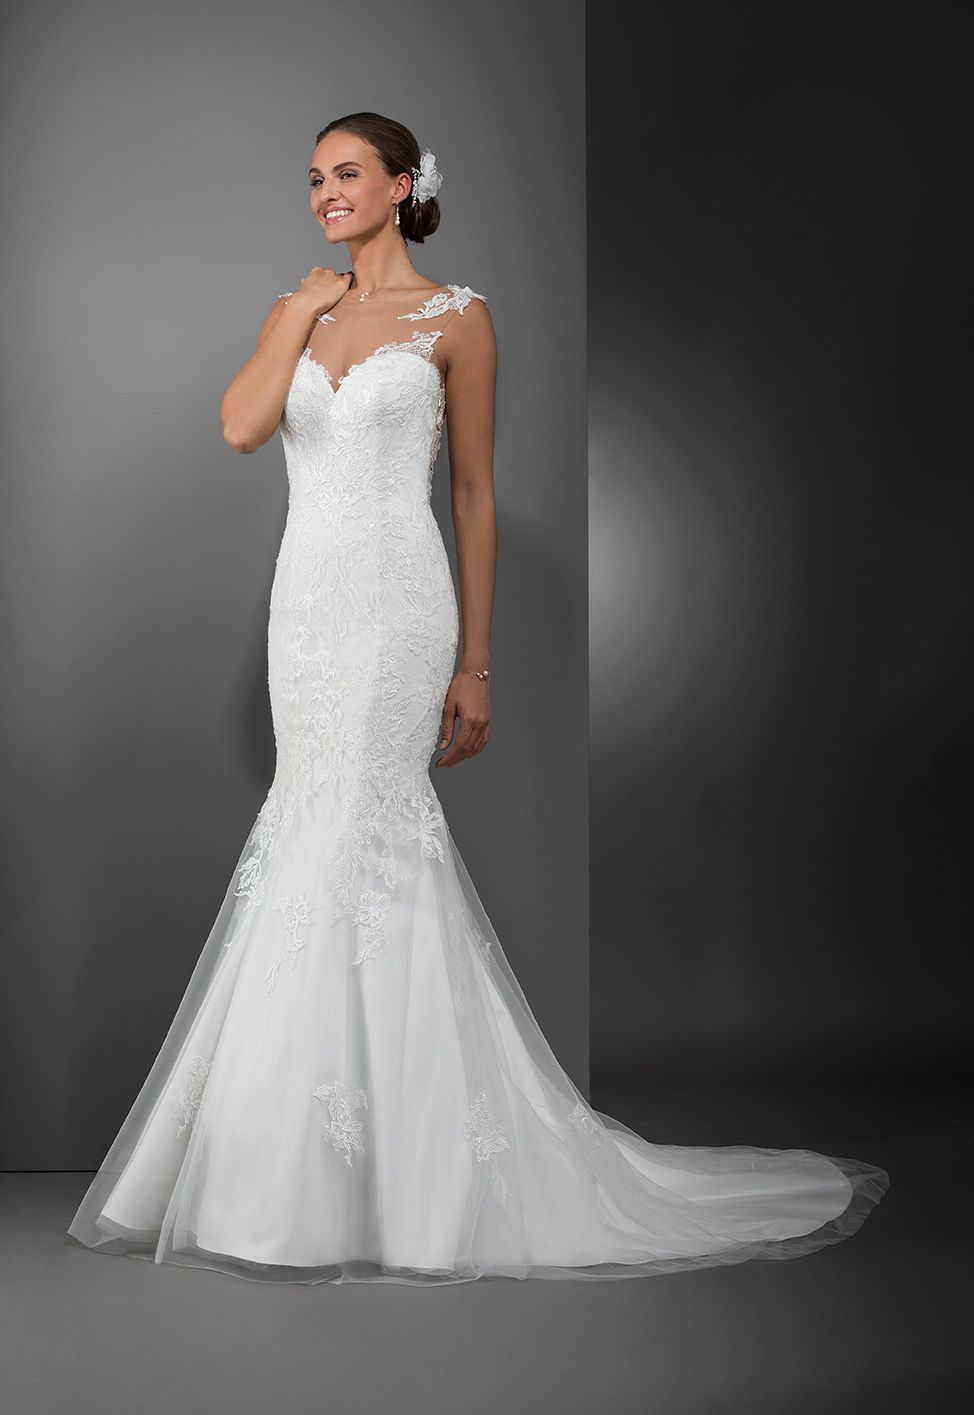 541f2f6f4fe78 Robe de mariée Dubaï | Robes de mariée Collection 2018 | Robe mariée ...